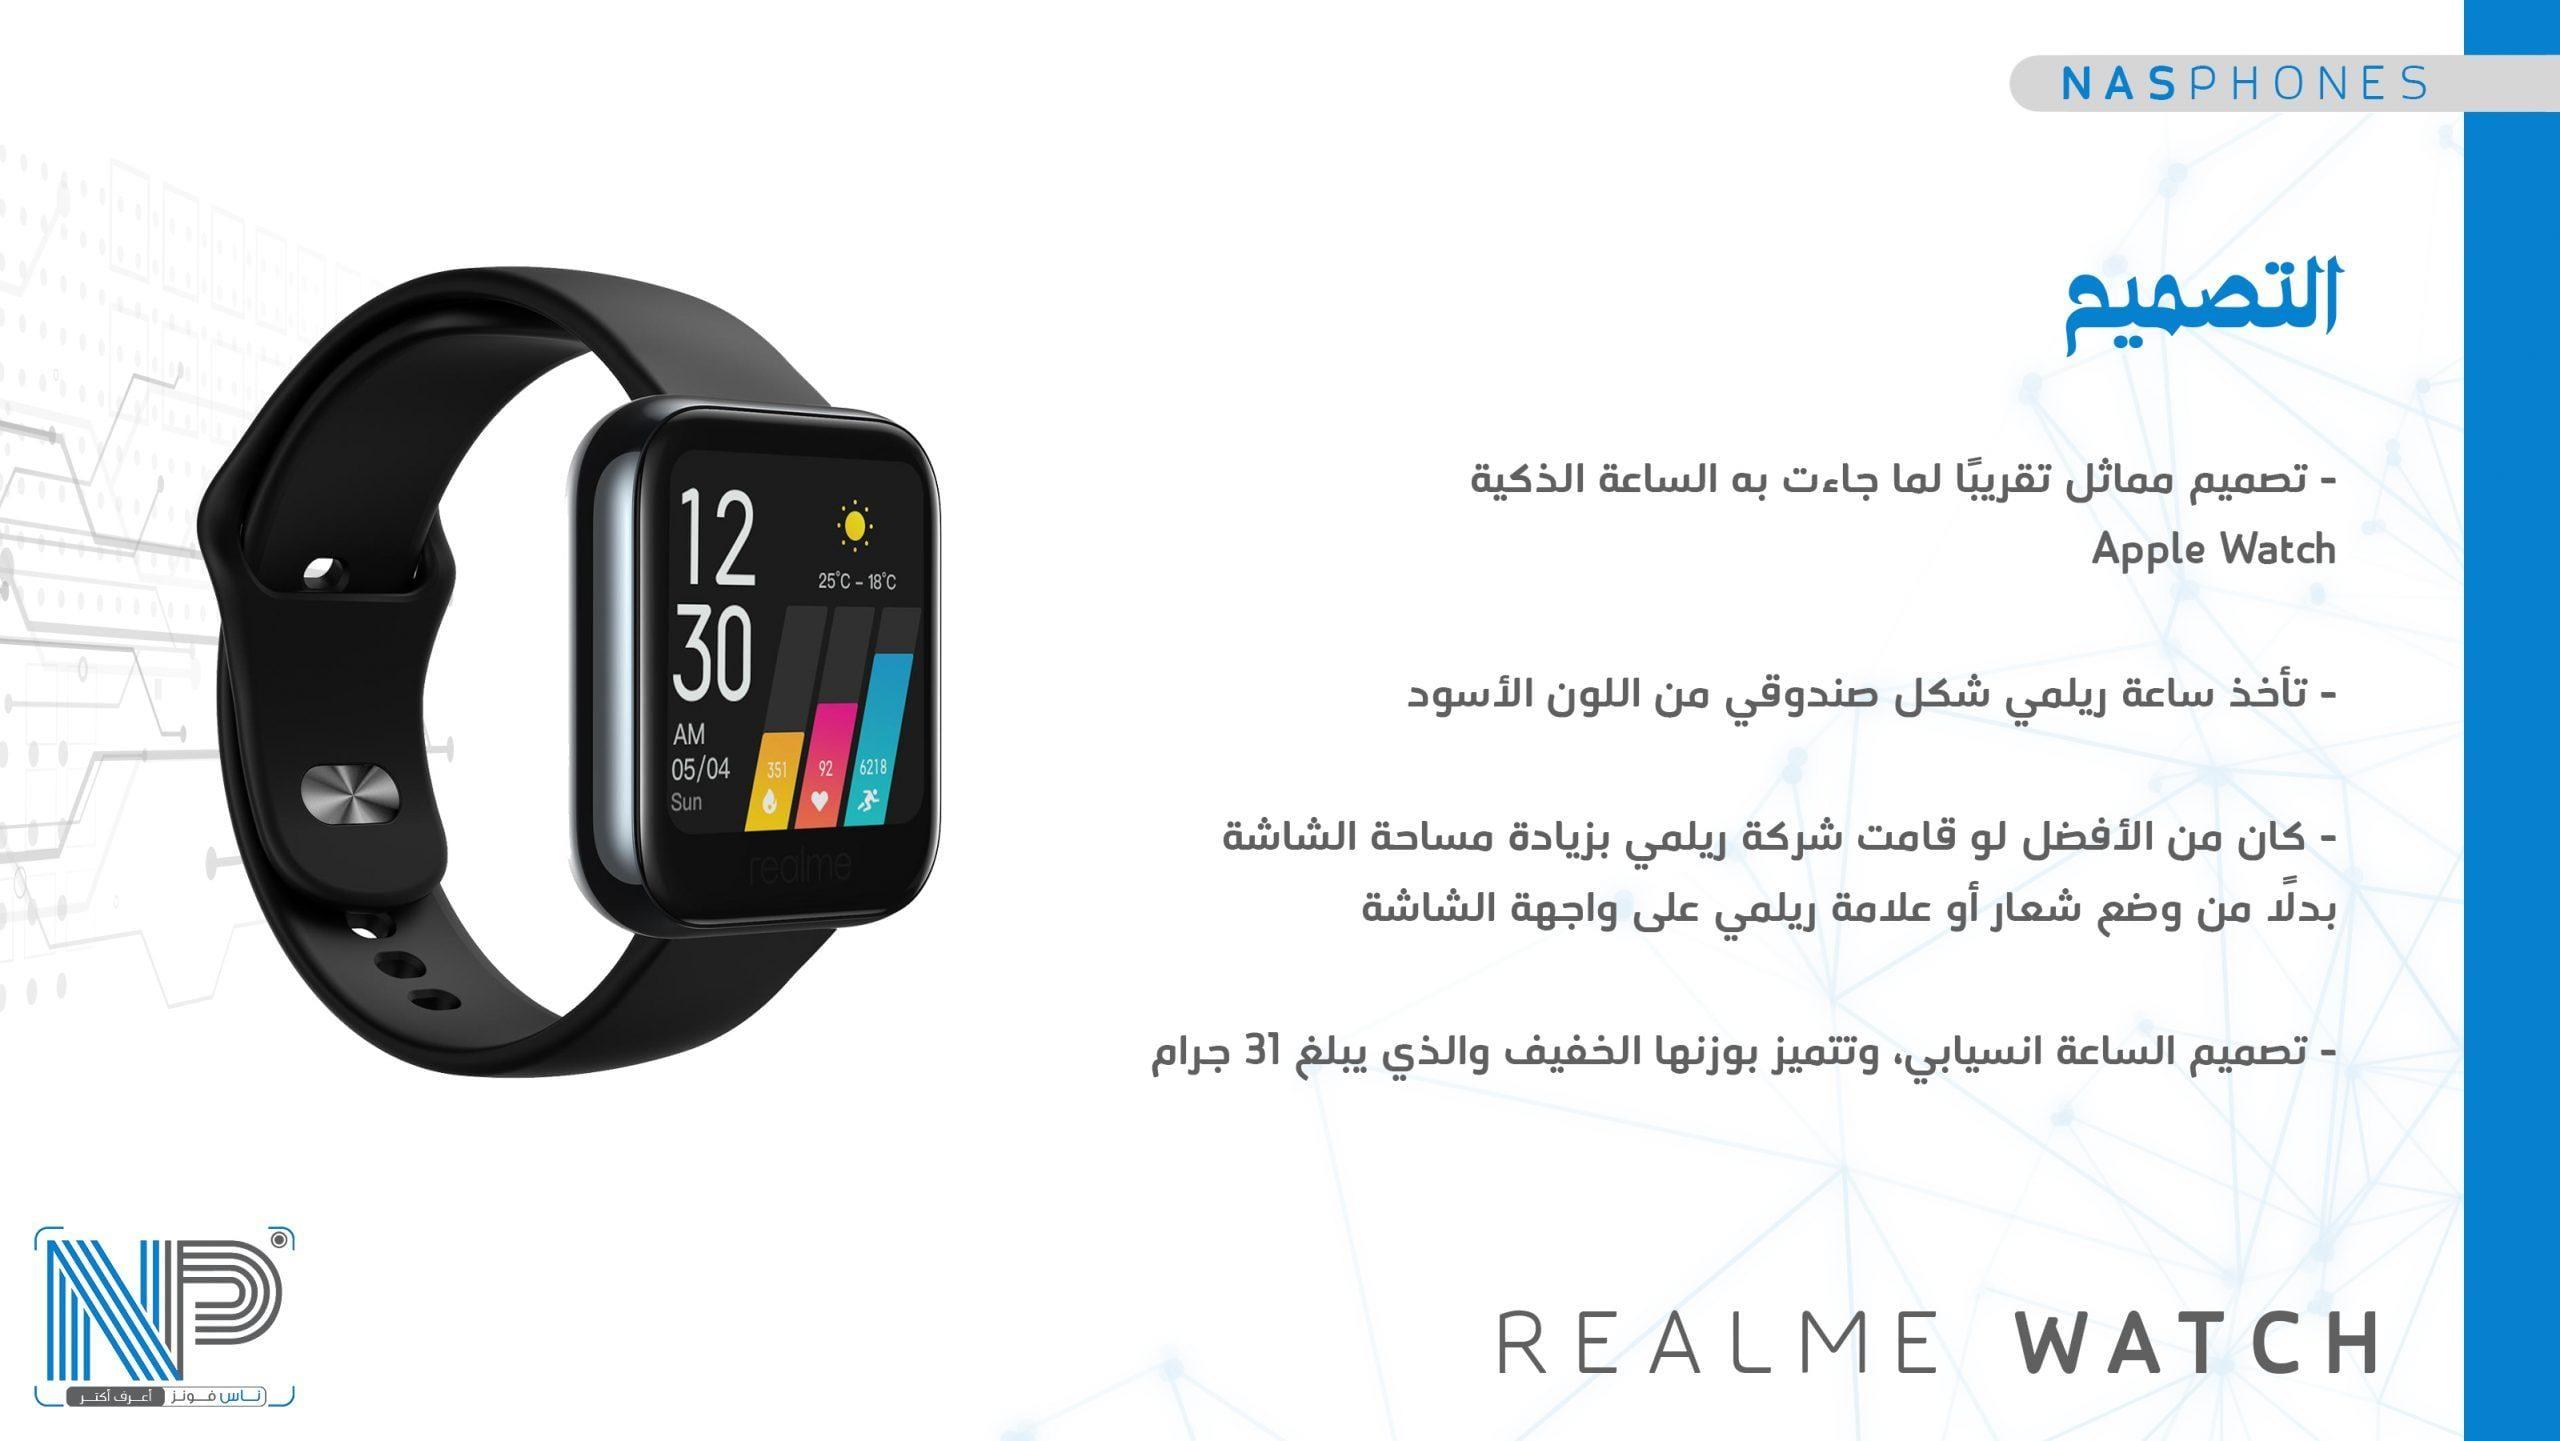 تصميم Realme watch